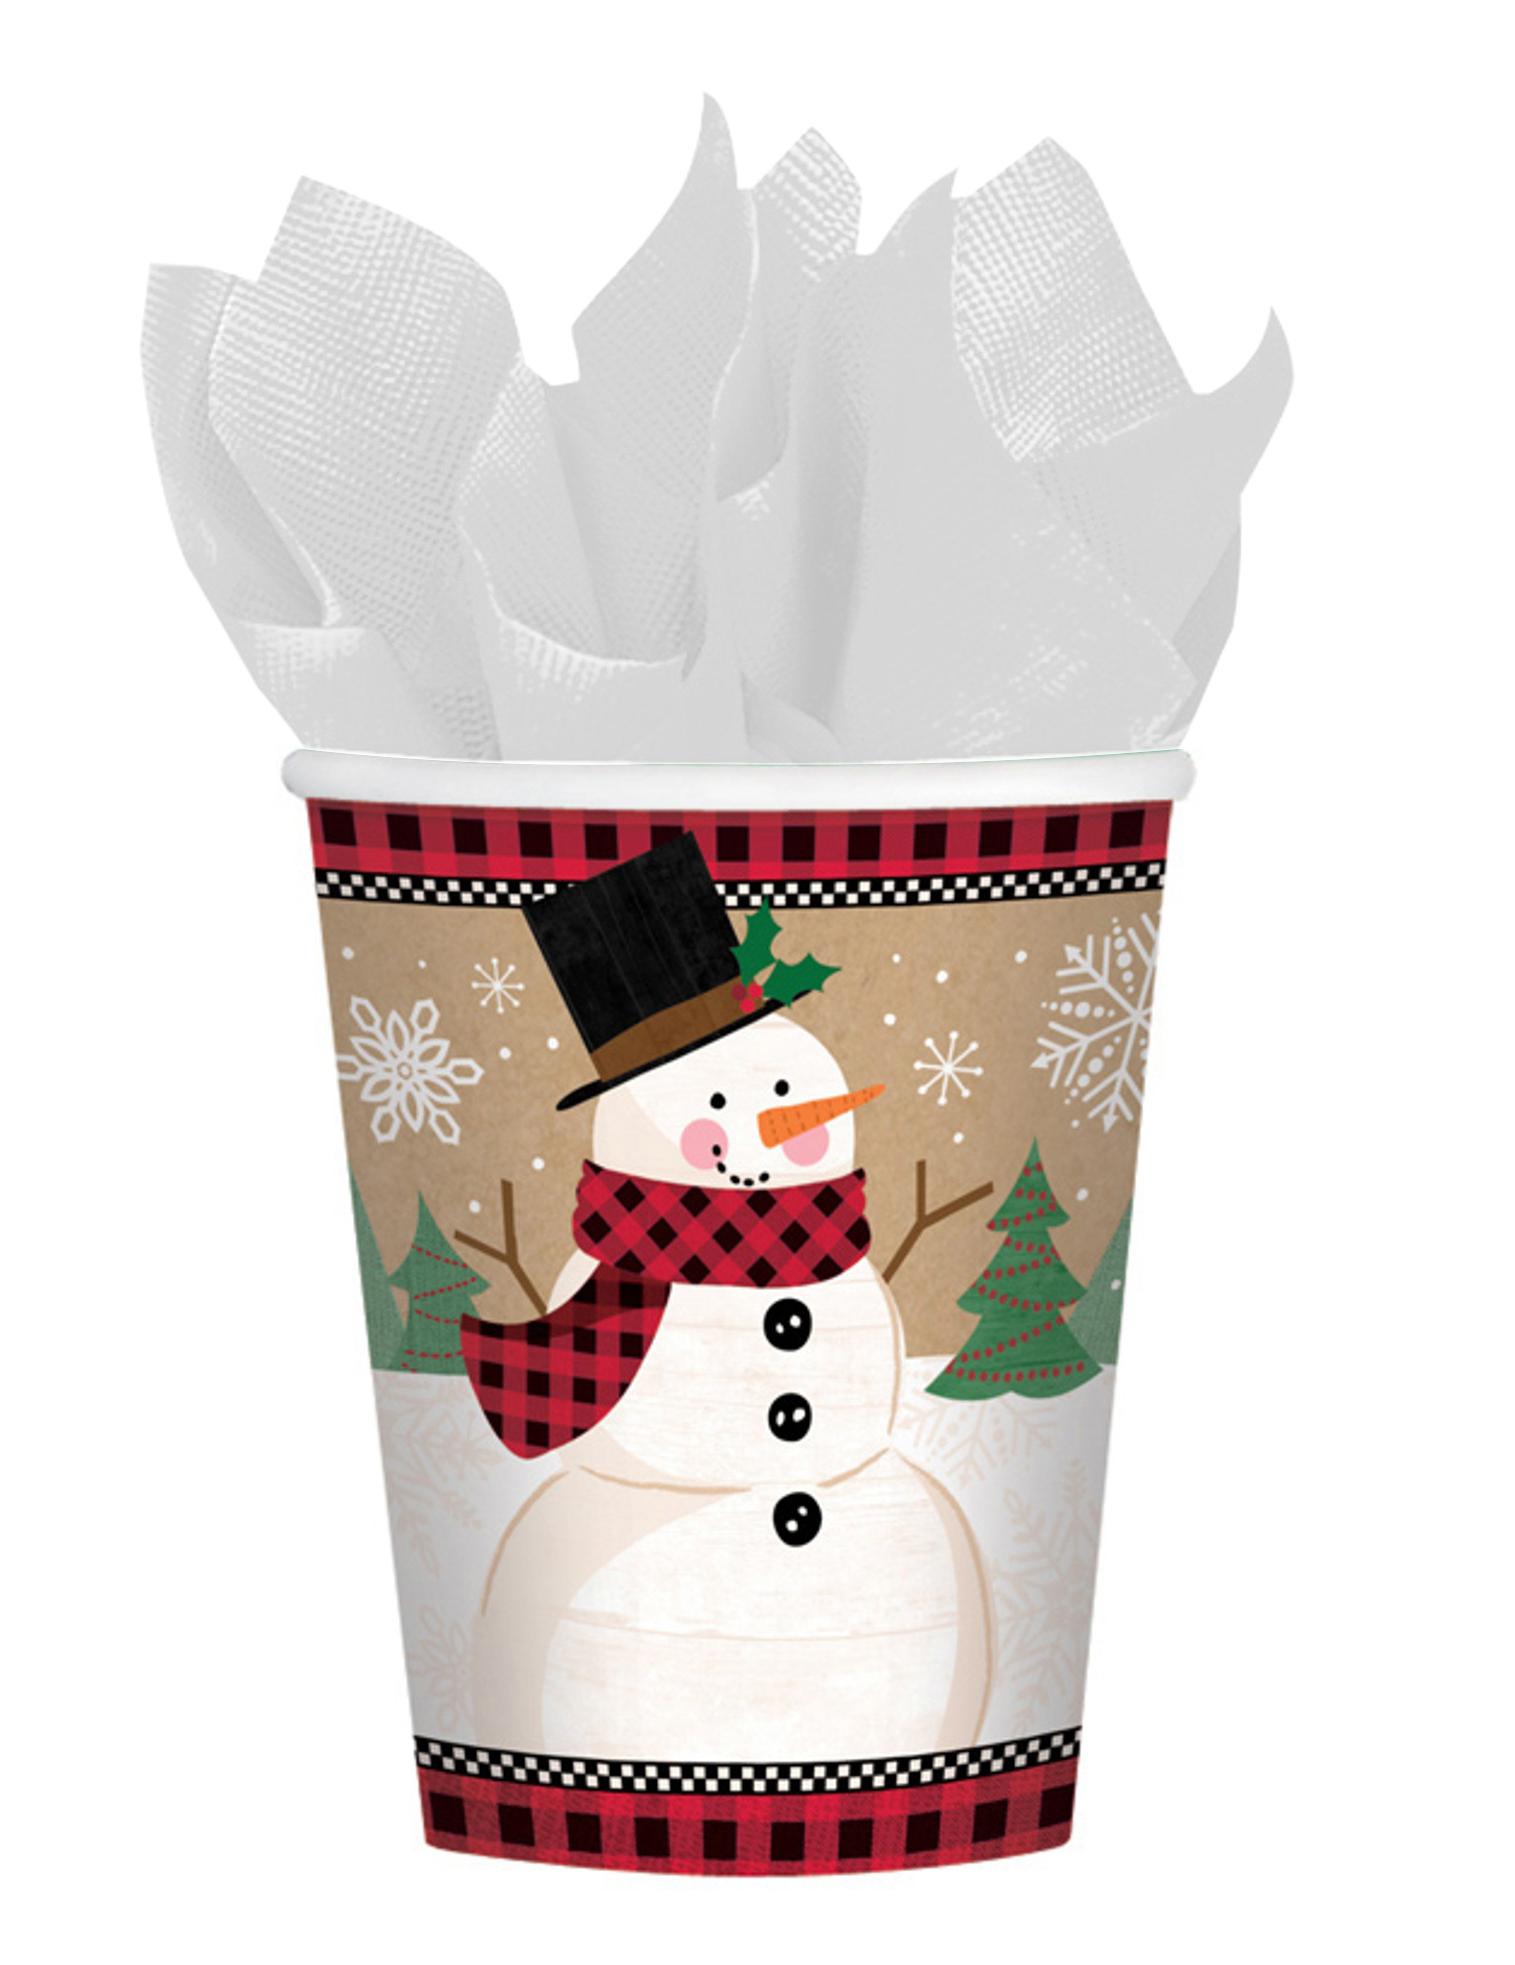 Stunning gobelets en carton bonhomme de neige ml with bonhomme neige gobelet - Faire un bonhomme de neige avec des gobelets ...